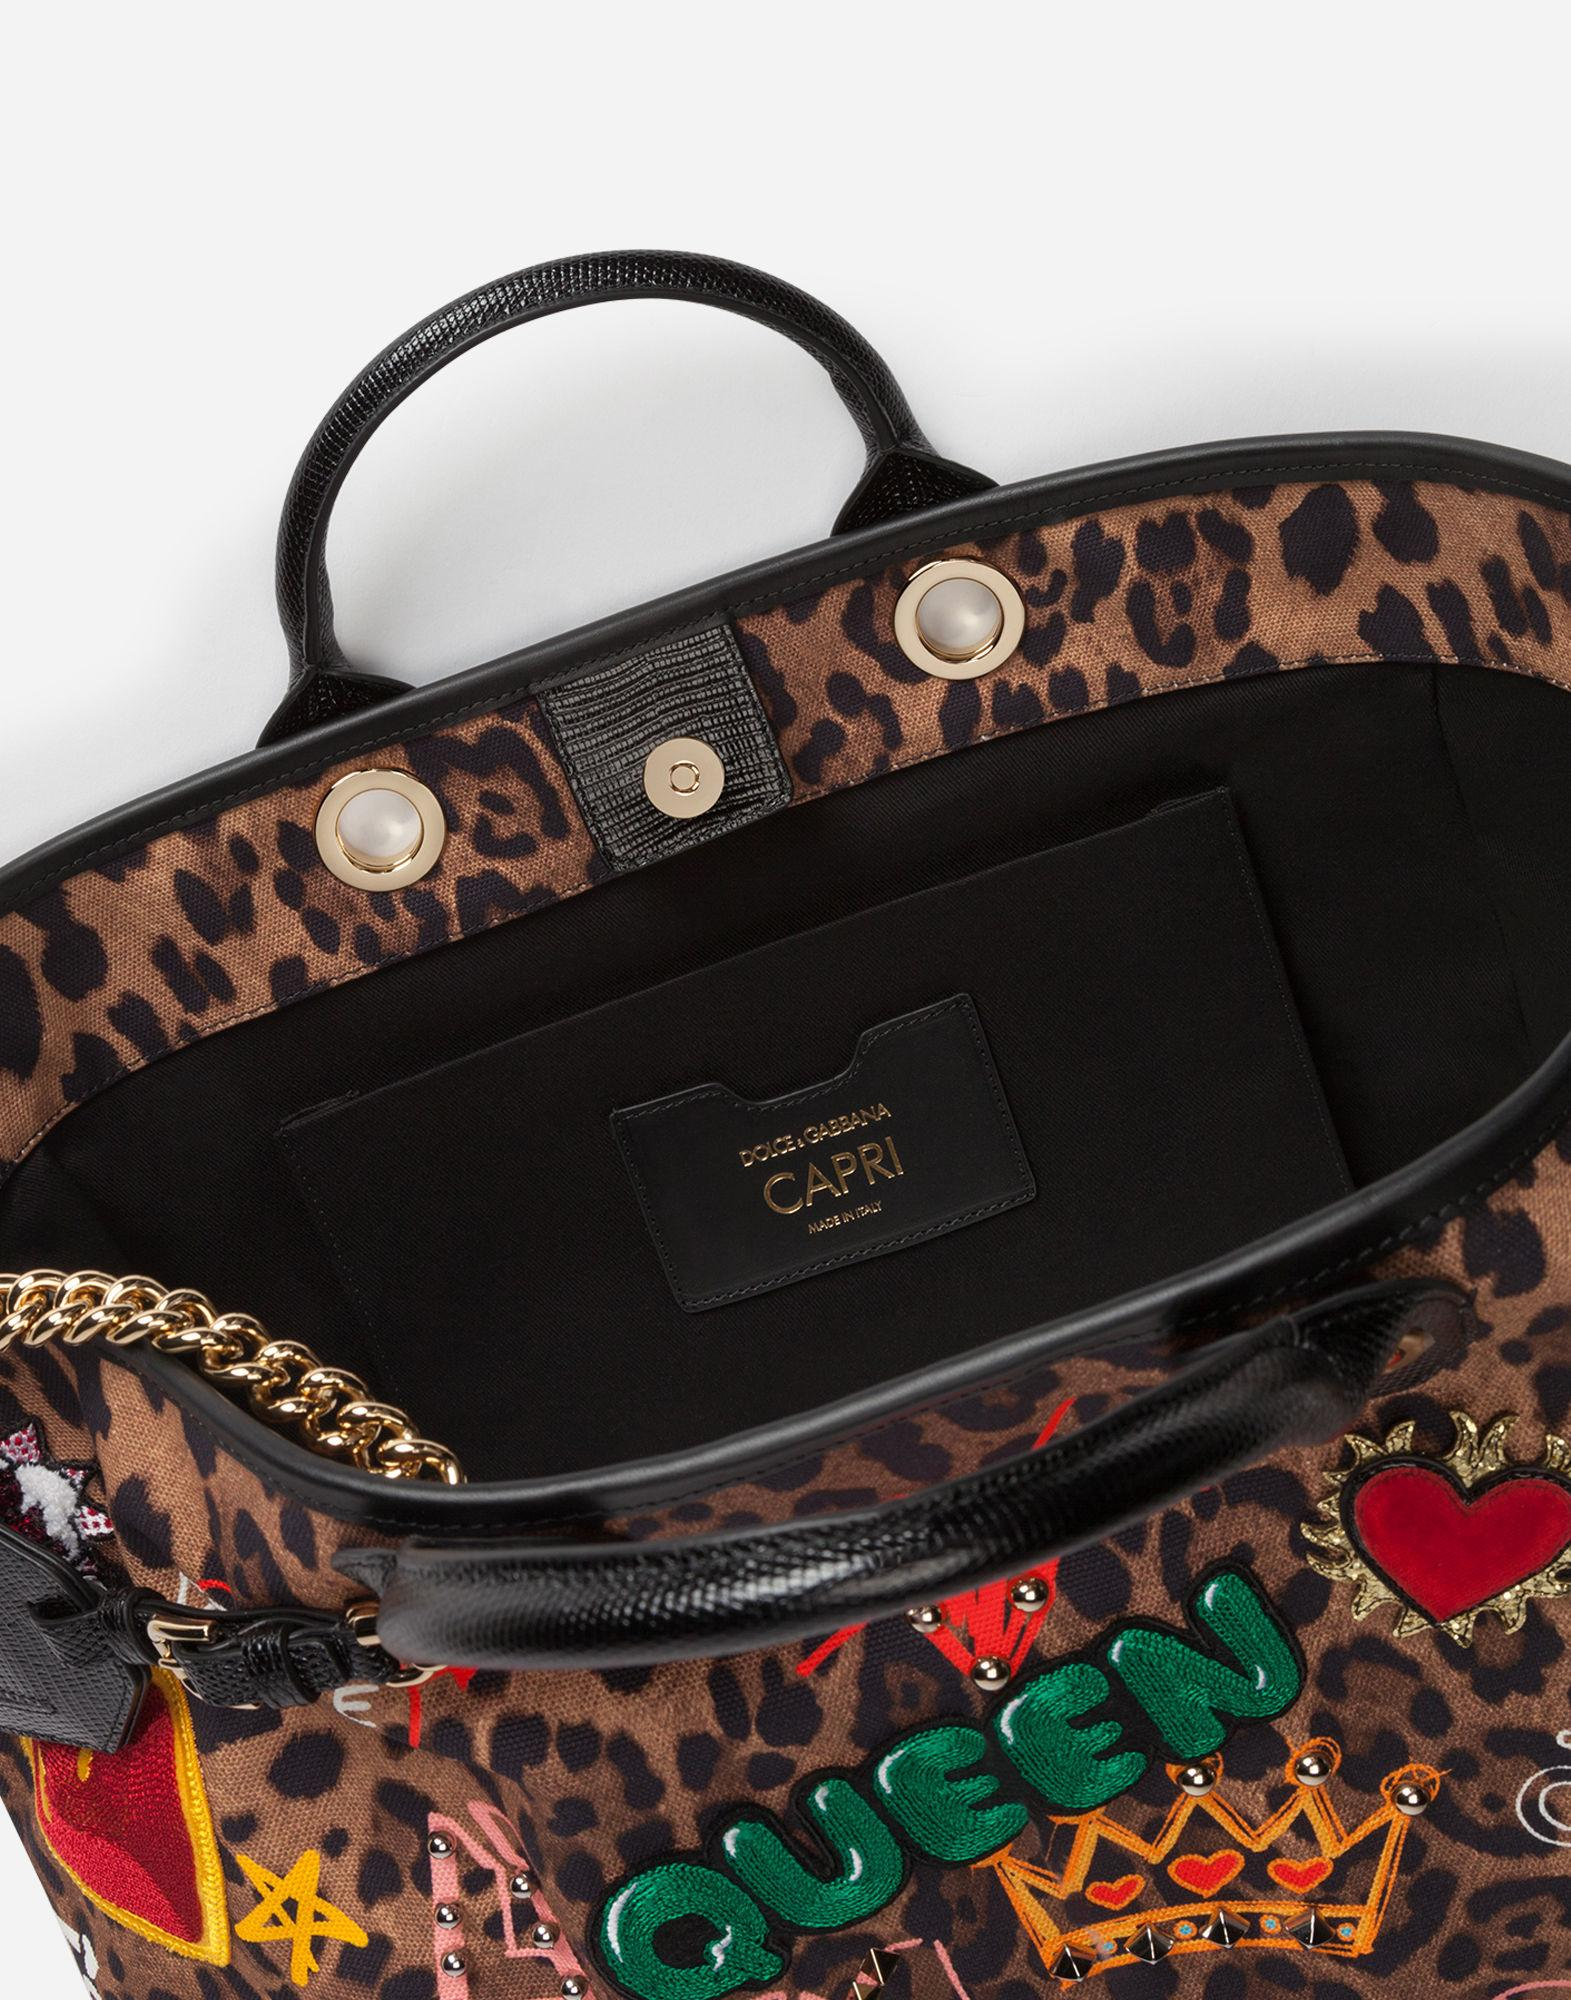 fa2a29d1c8 Dolce   Gabbana Capri Shopping Bag In Printed Fabric And Patch Applications  And Iguana Print Calfskin